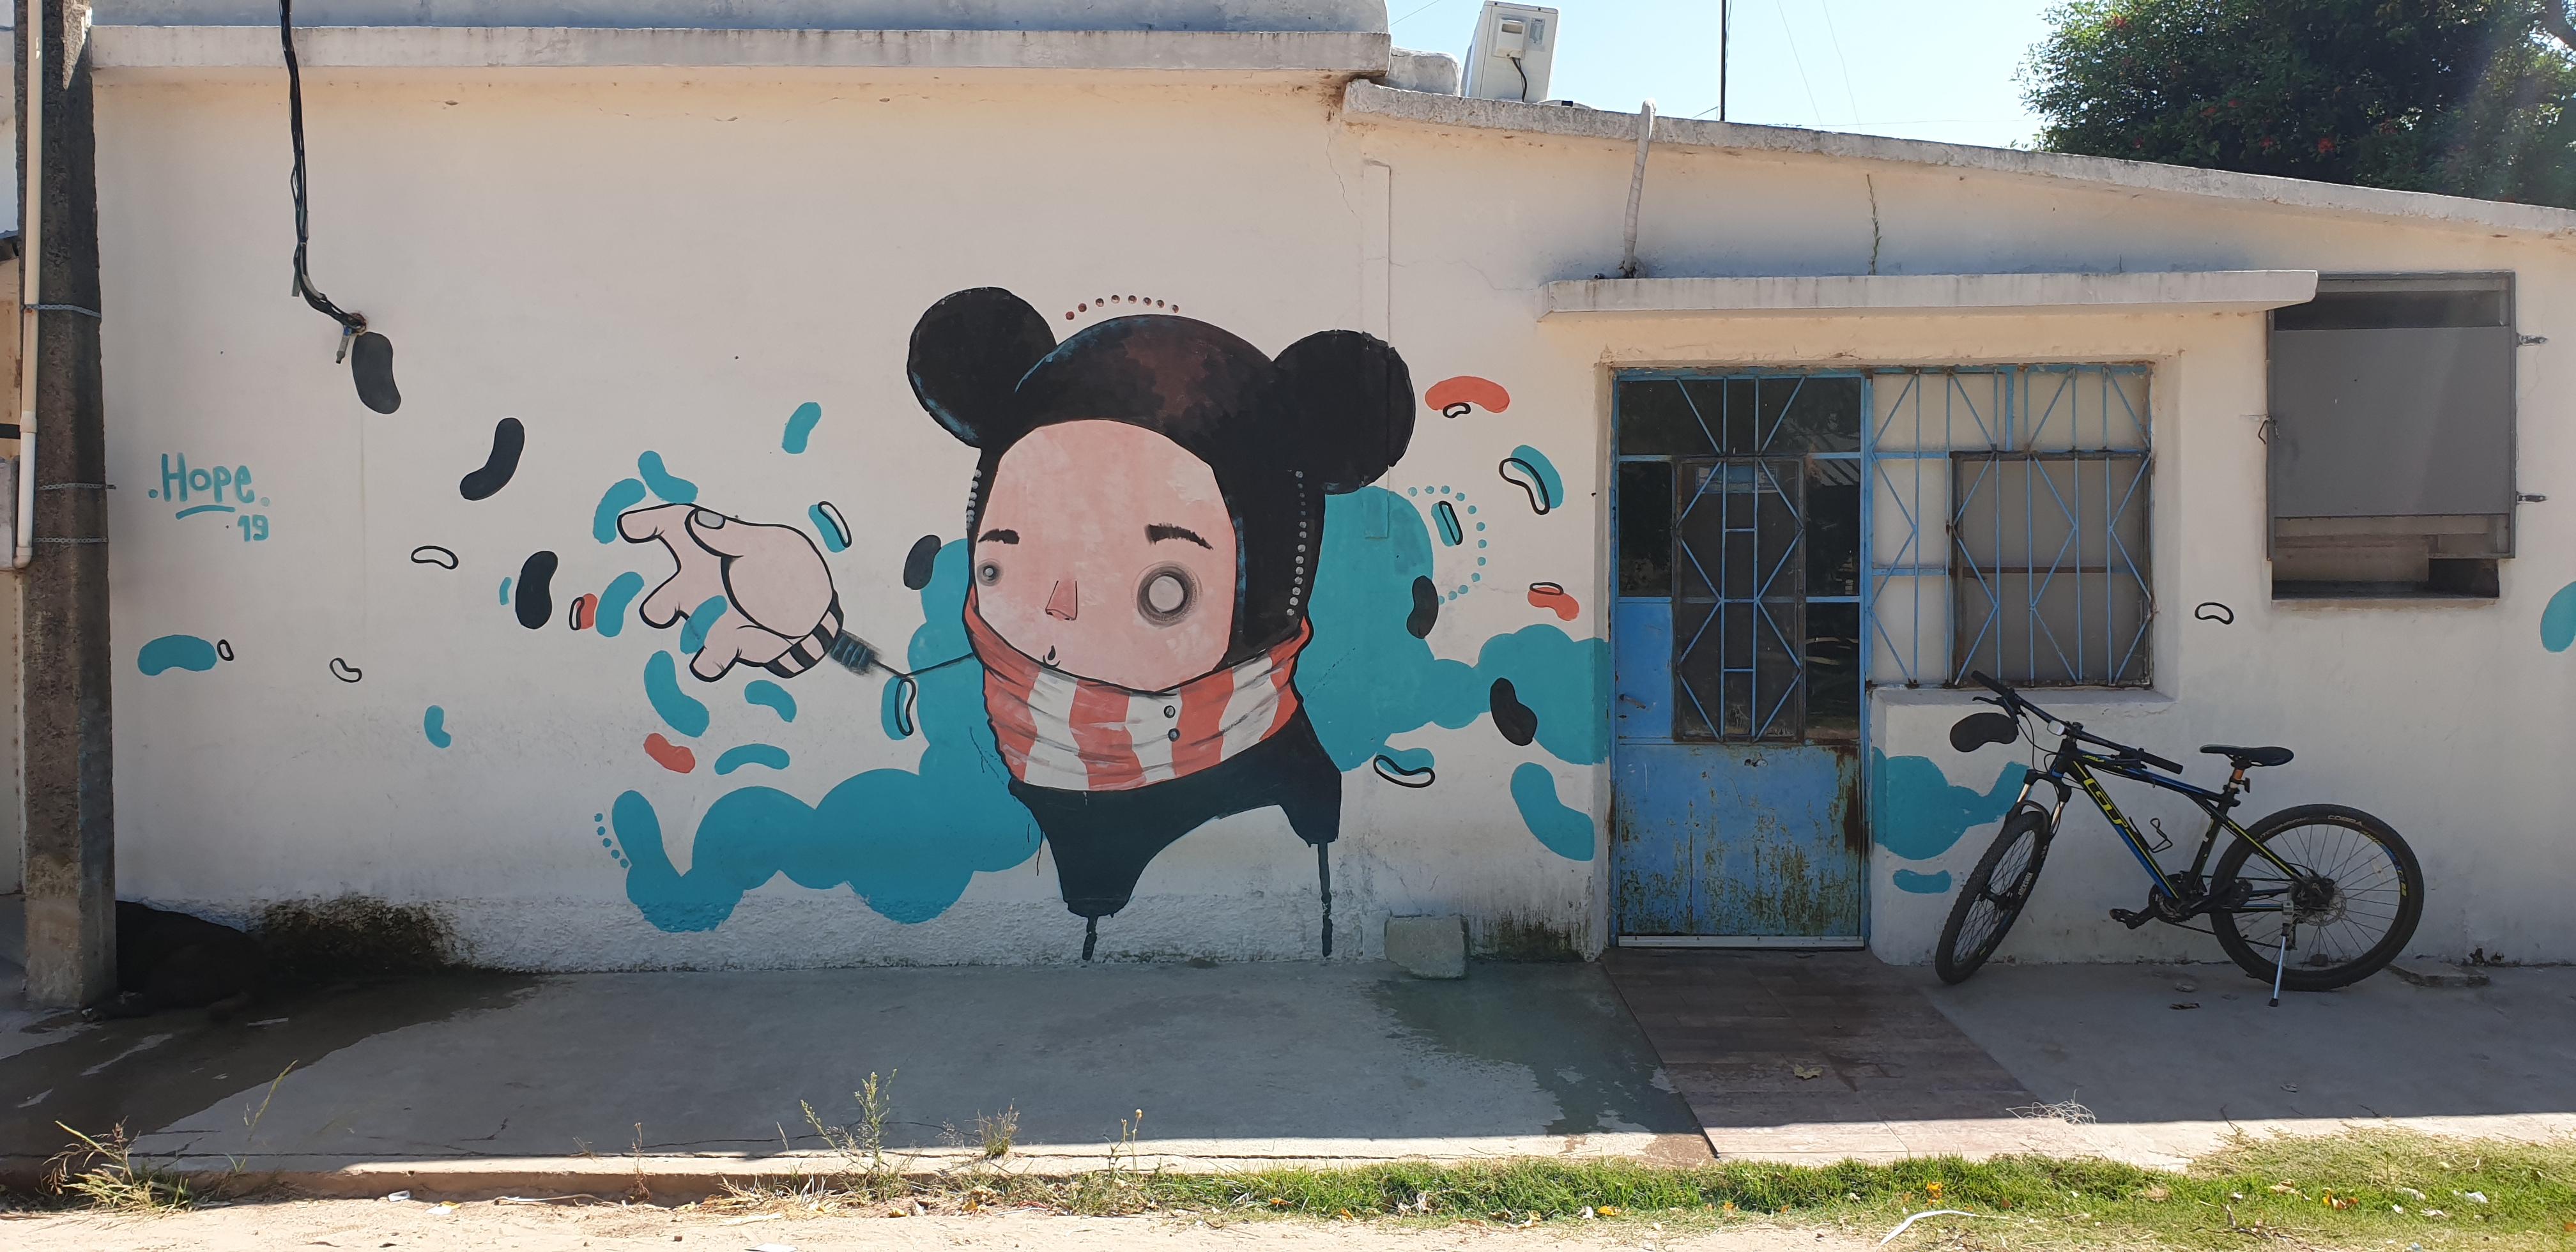 Mur réalisé par HOPE - Villa Soriano - Uruguay 2020 - ©nofakeinmynews.com